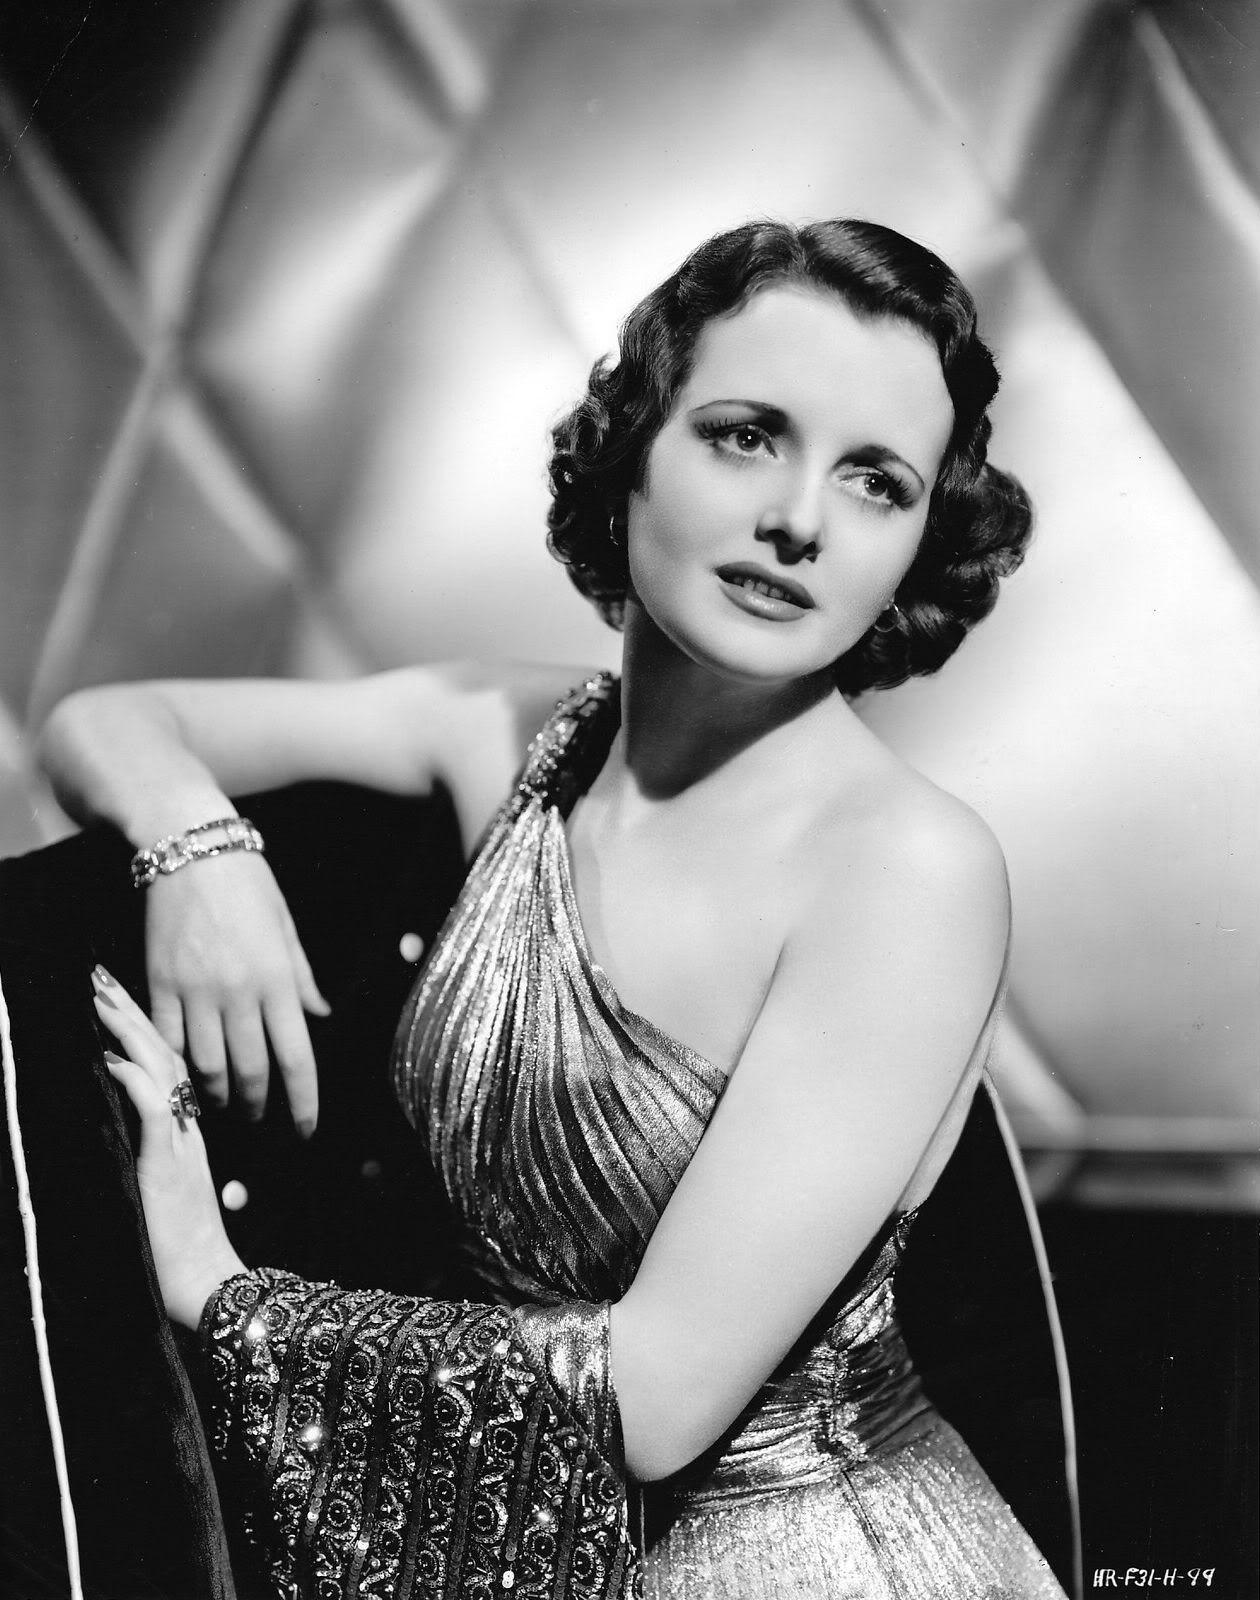 Mary Astor 1940